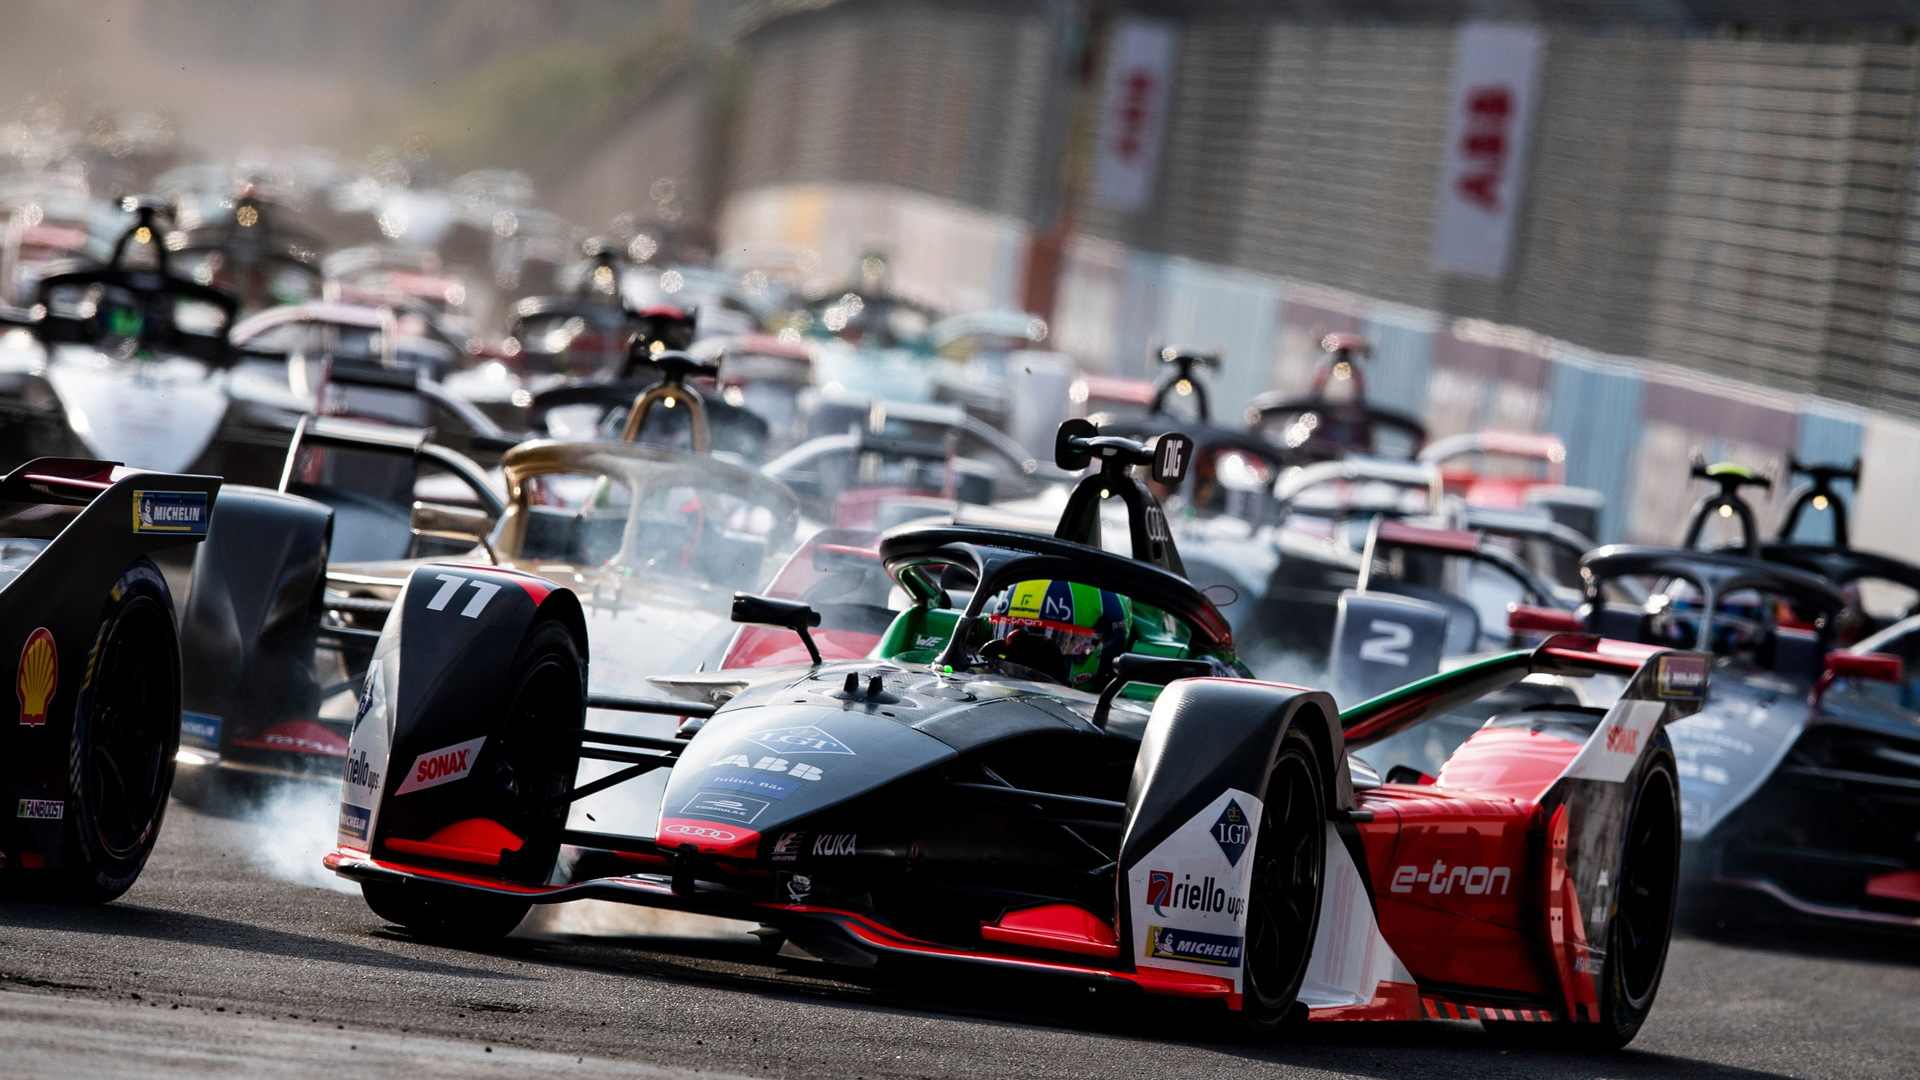 2019/2020 Formula E Diriyah E-Prix